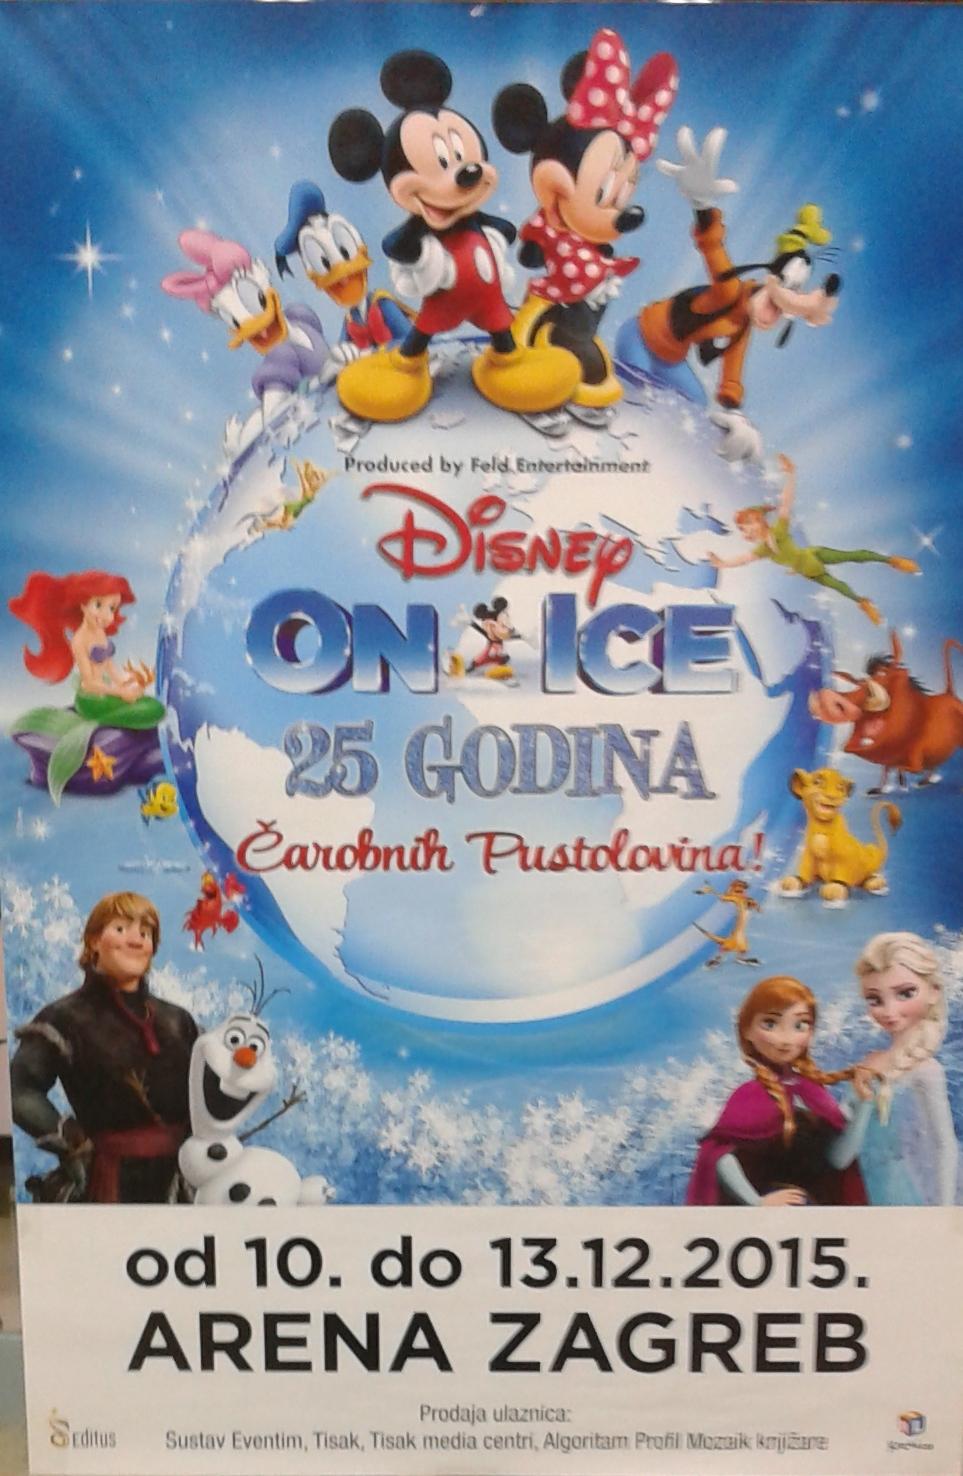 Proslavi ročkas u En-ten-tiniju i osvoji ulaznice za DISNEY ON ICE!